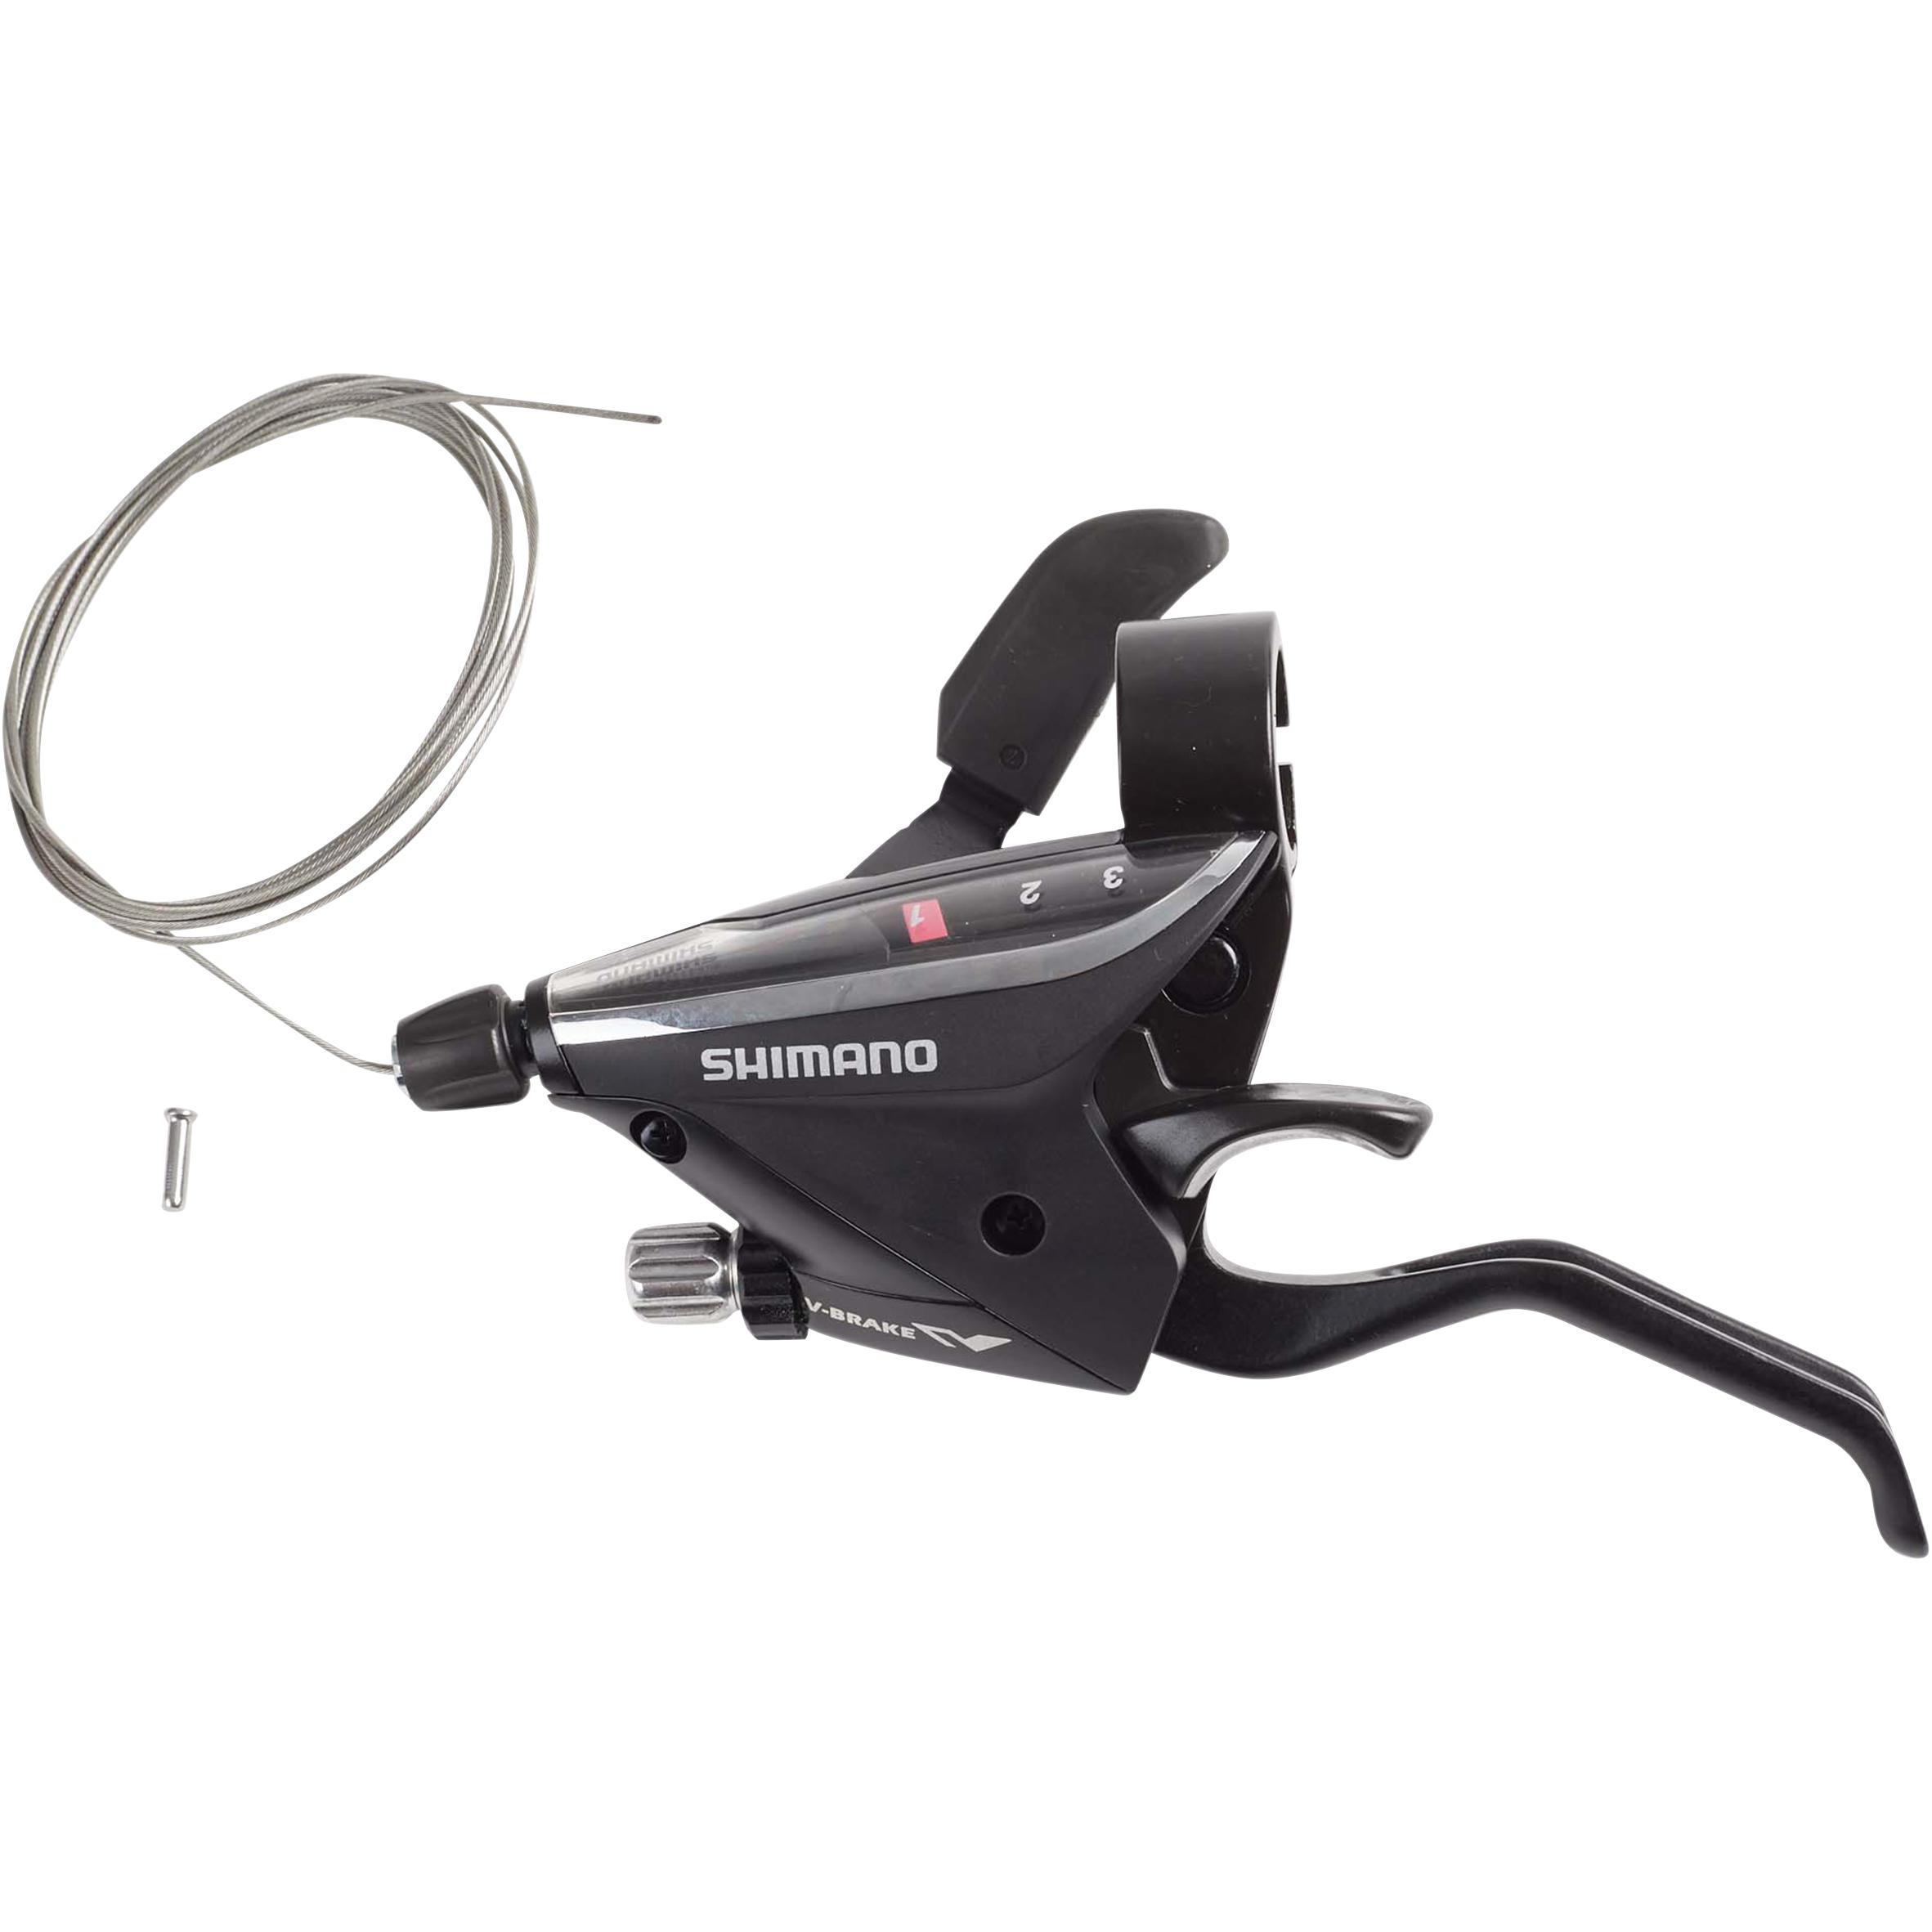 Shimano Shifter en remhendel 3v Shimano zwart kopen